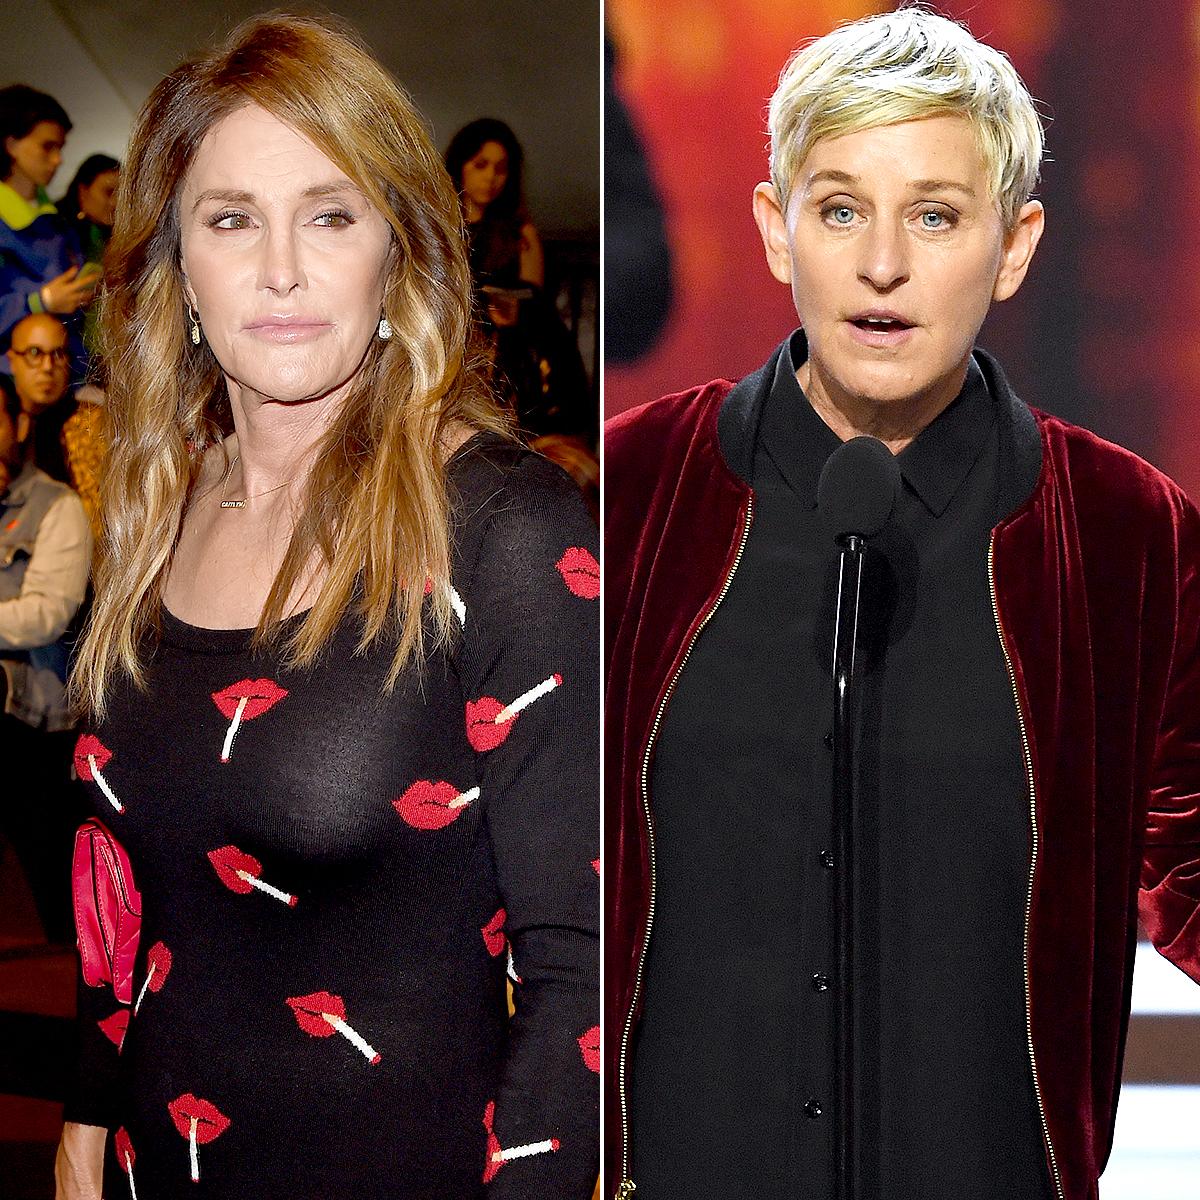 Caitlyn Jenner and Ellen DeGeneres